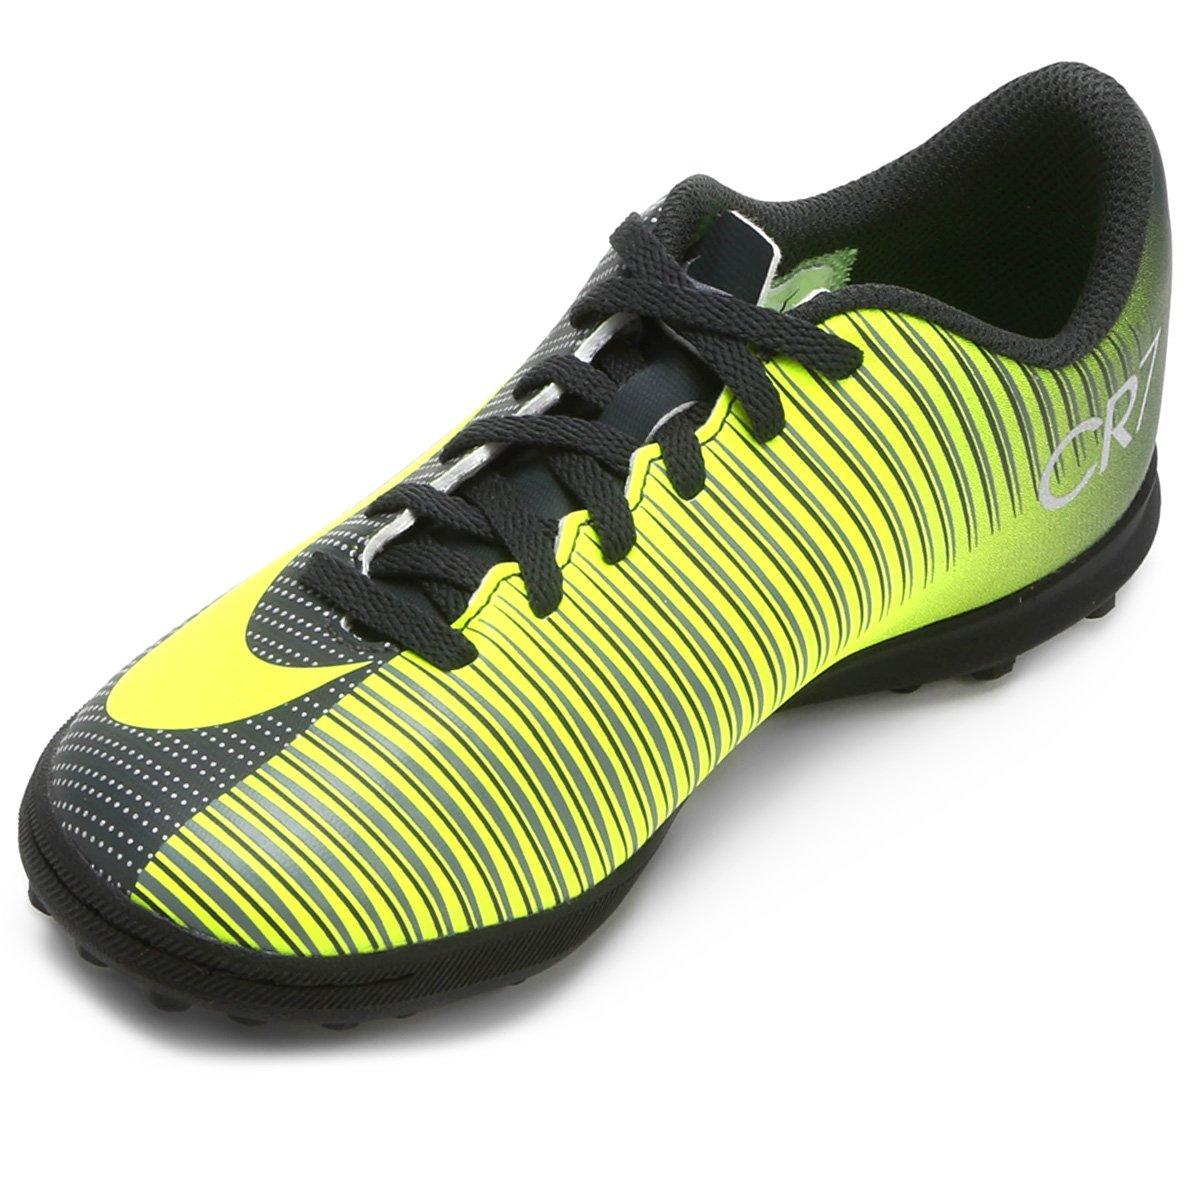 5fcd6ae8c4 Chuteira Society Infantil Nike Mercurial X Vortex 3 CR7 TF - Compre ...